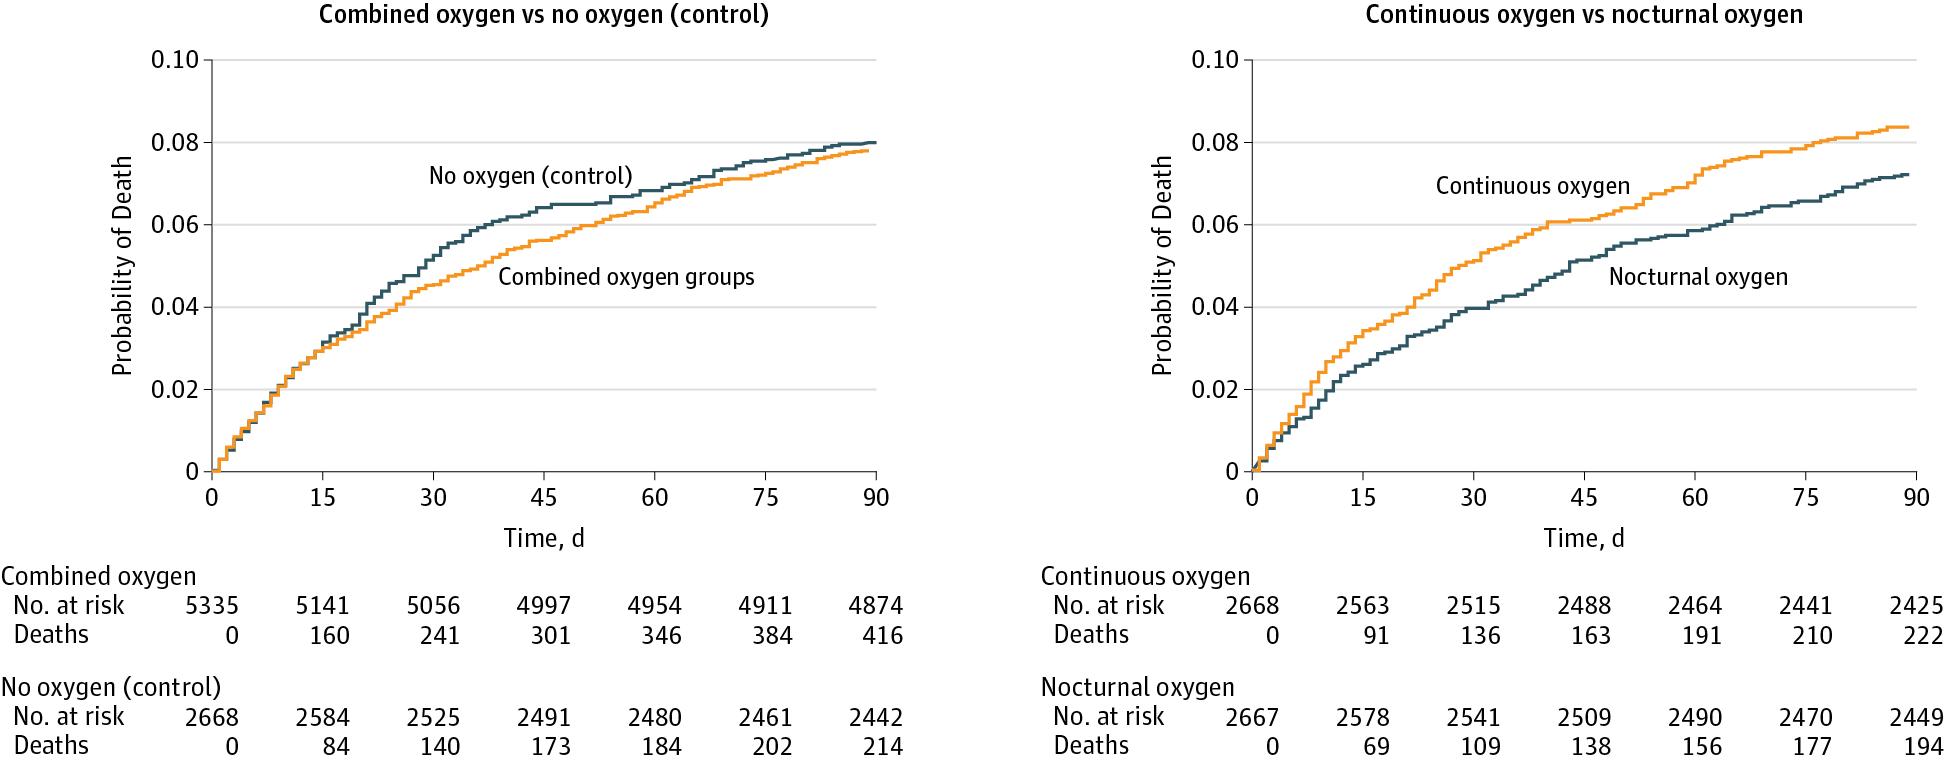 [MEDSCAPE神经内科]:急性卒中患者常规接受氧疗并无益处